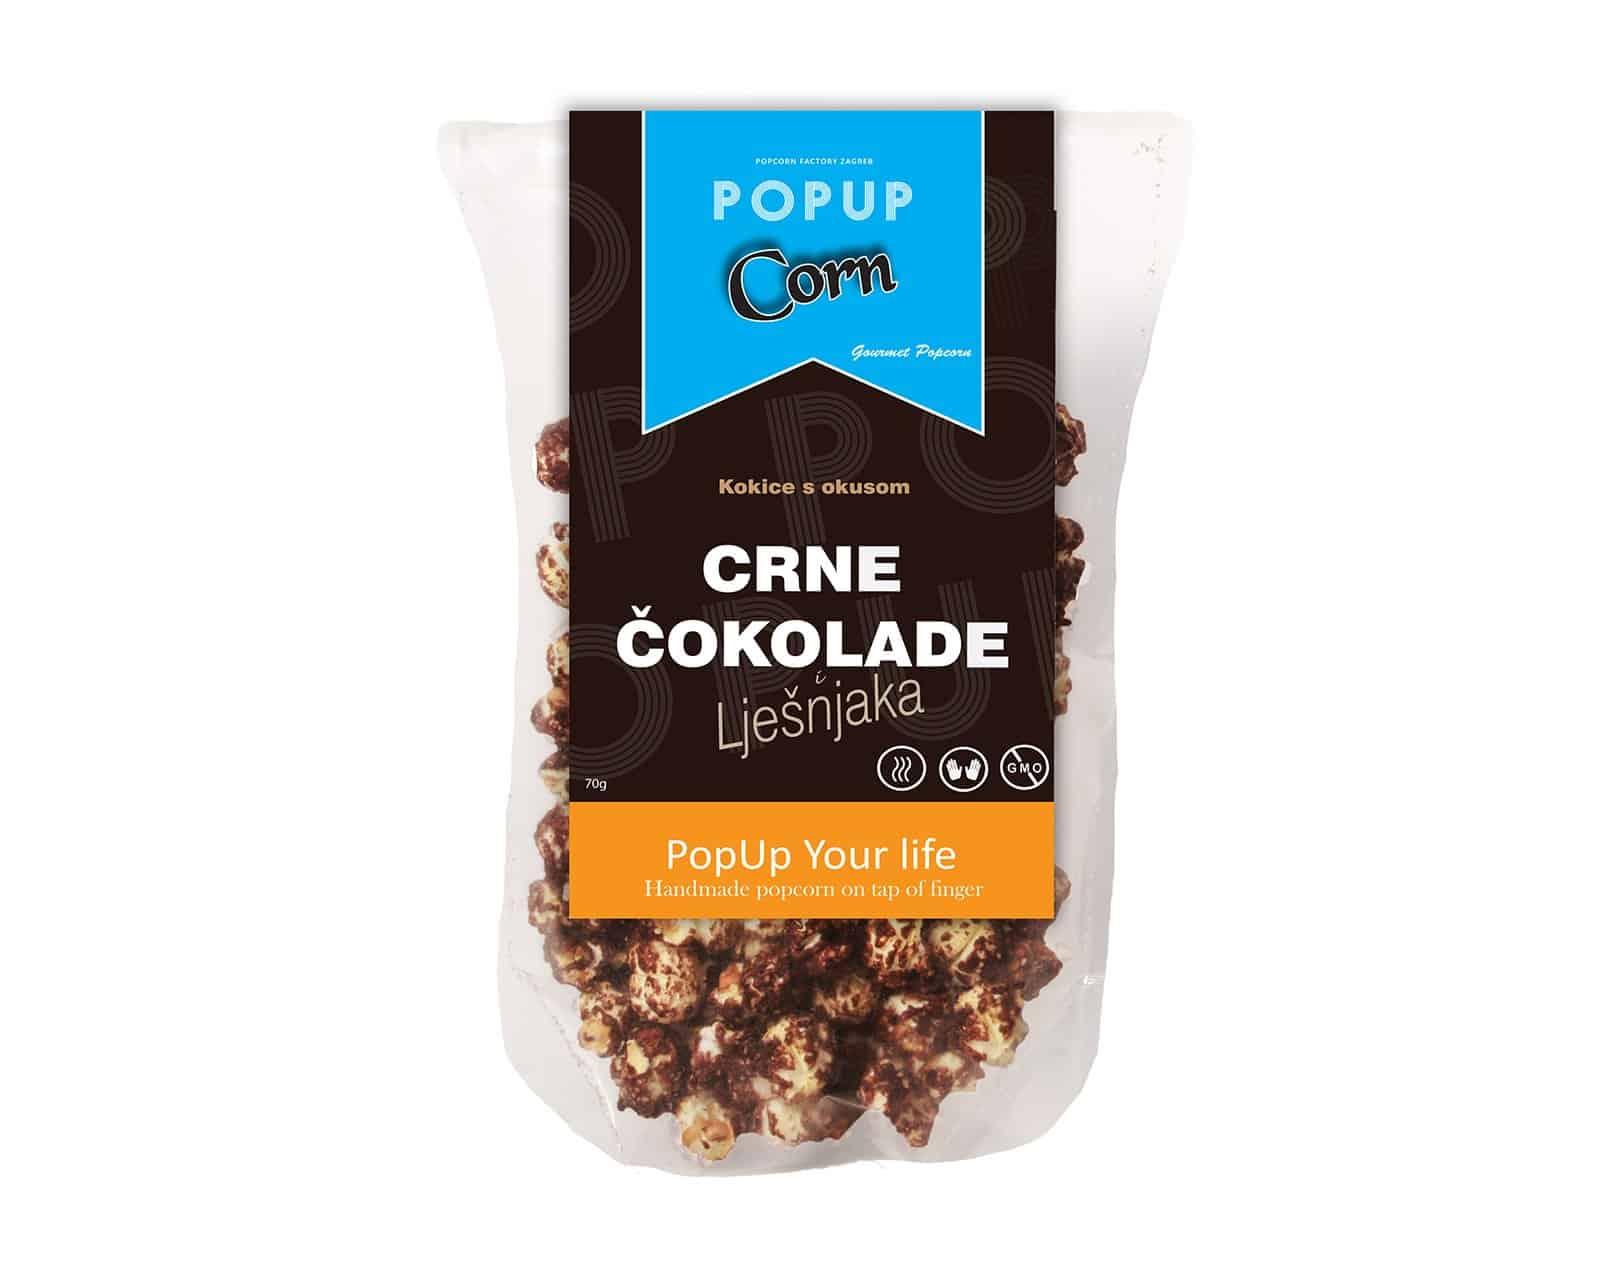 PopUp Corn crna čokolada 70g